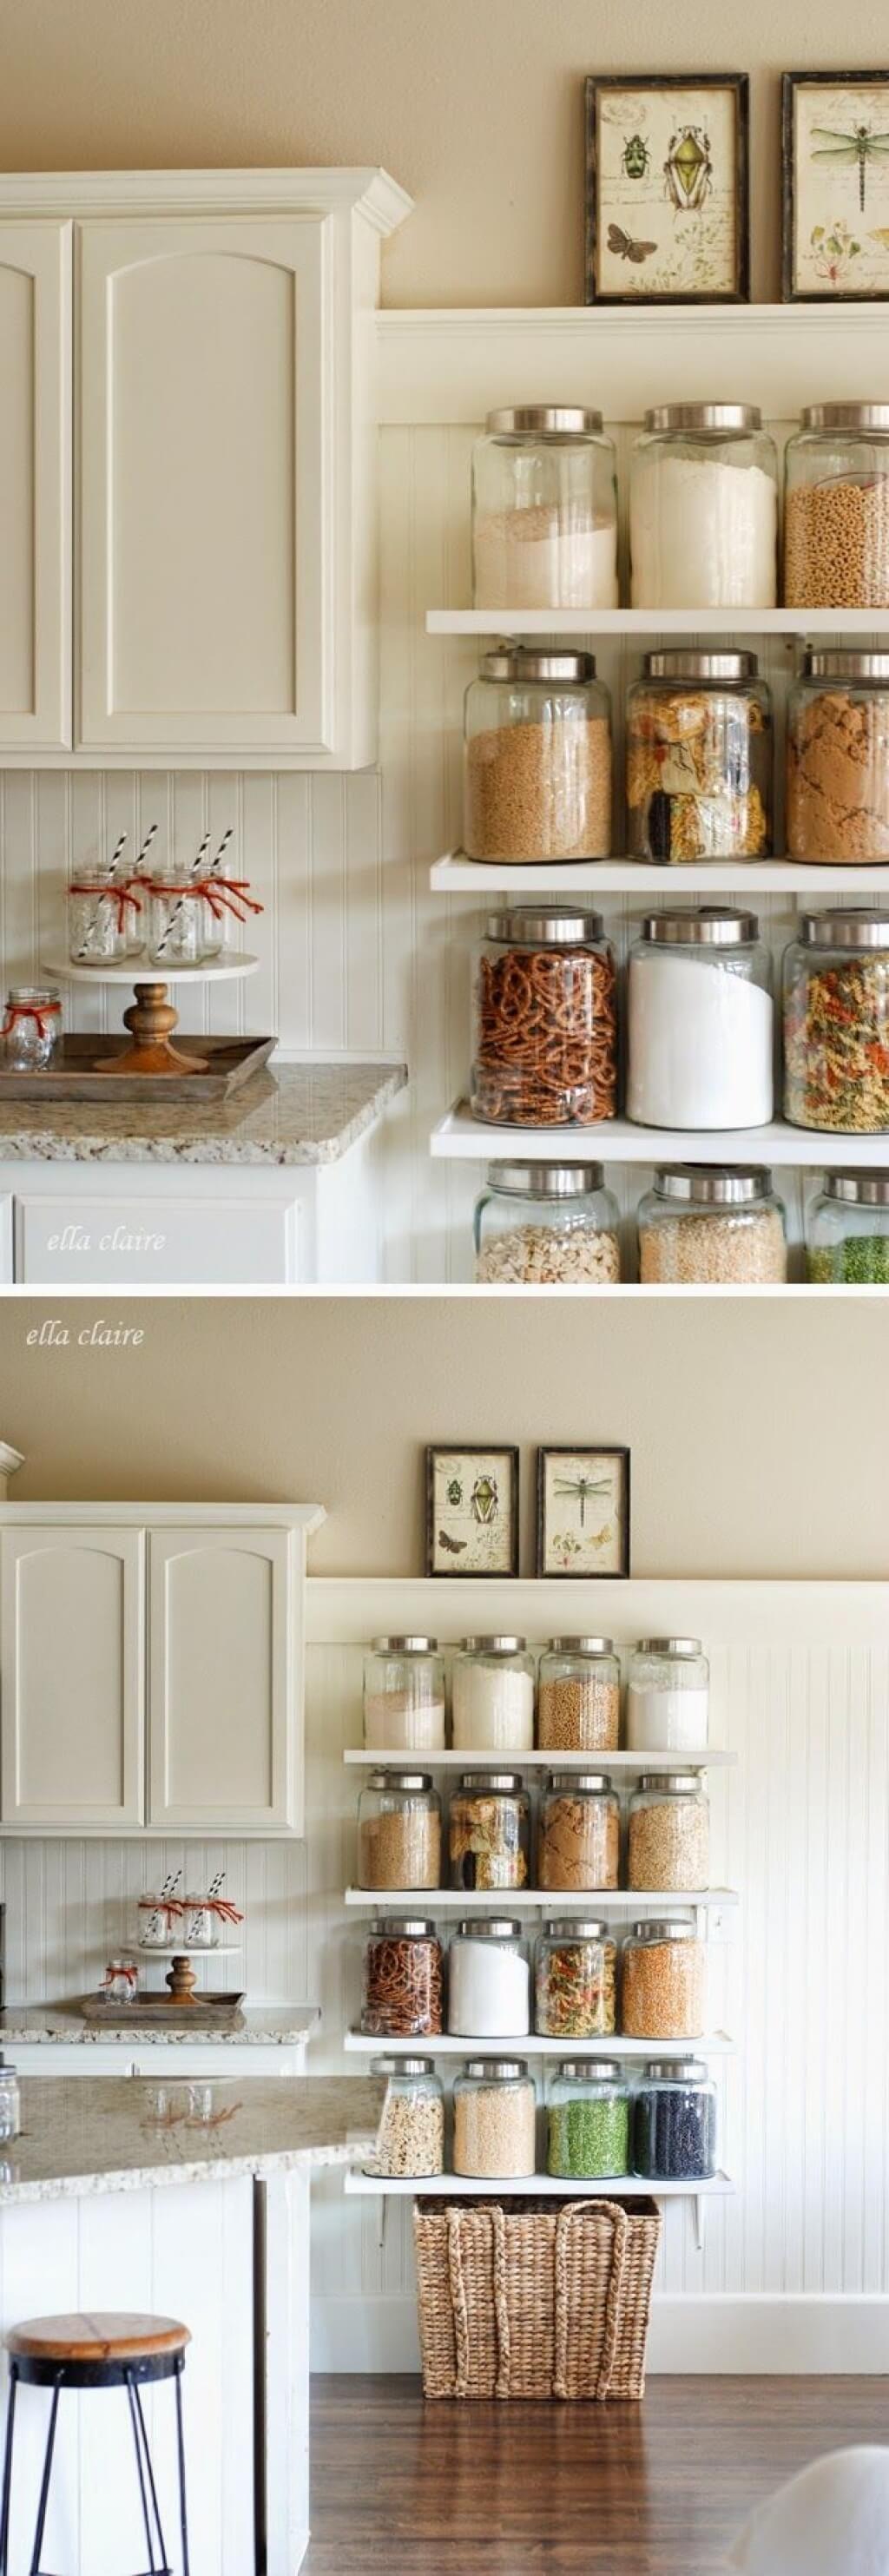 Shelf over kitchen window   practical storage ideas for a small kitchen organization  snacks